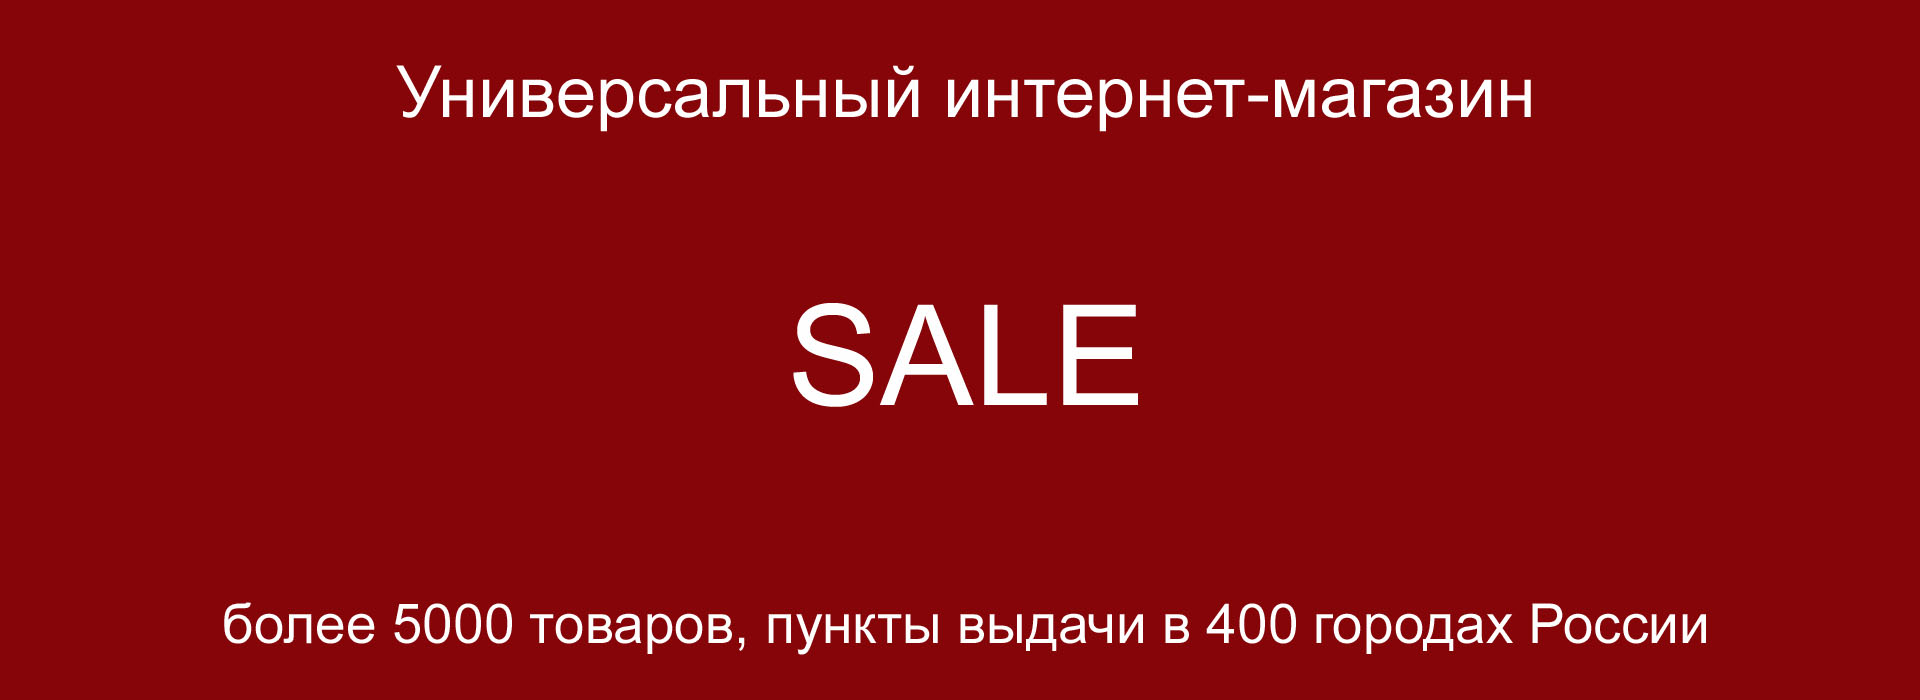 Купи товары Амарон со скидкой до 60%